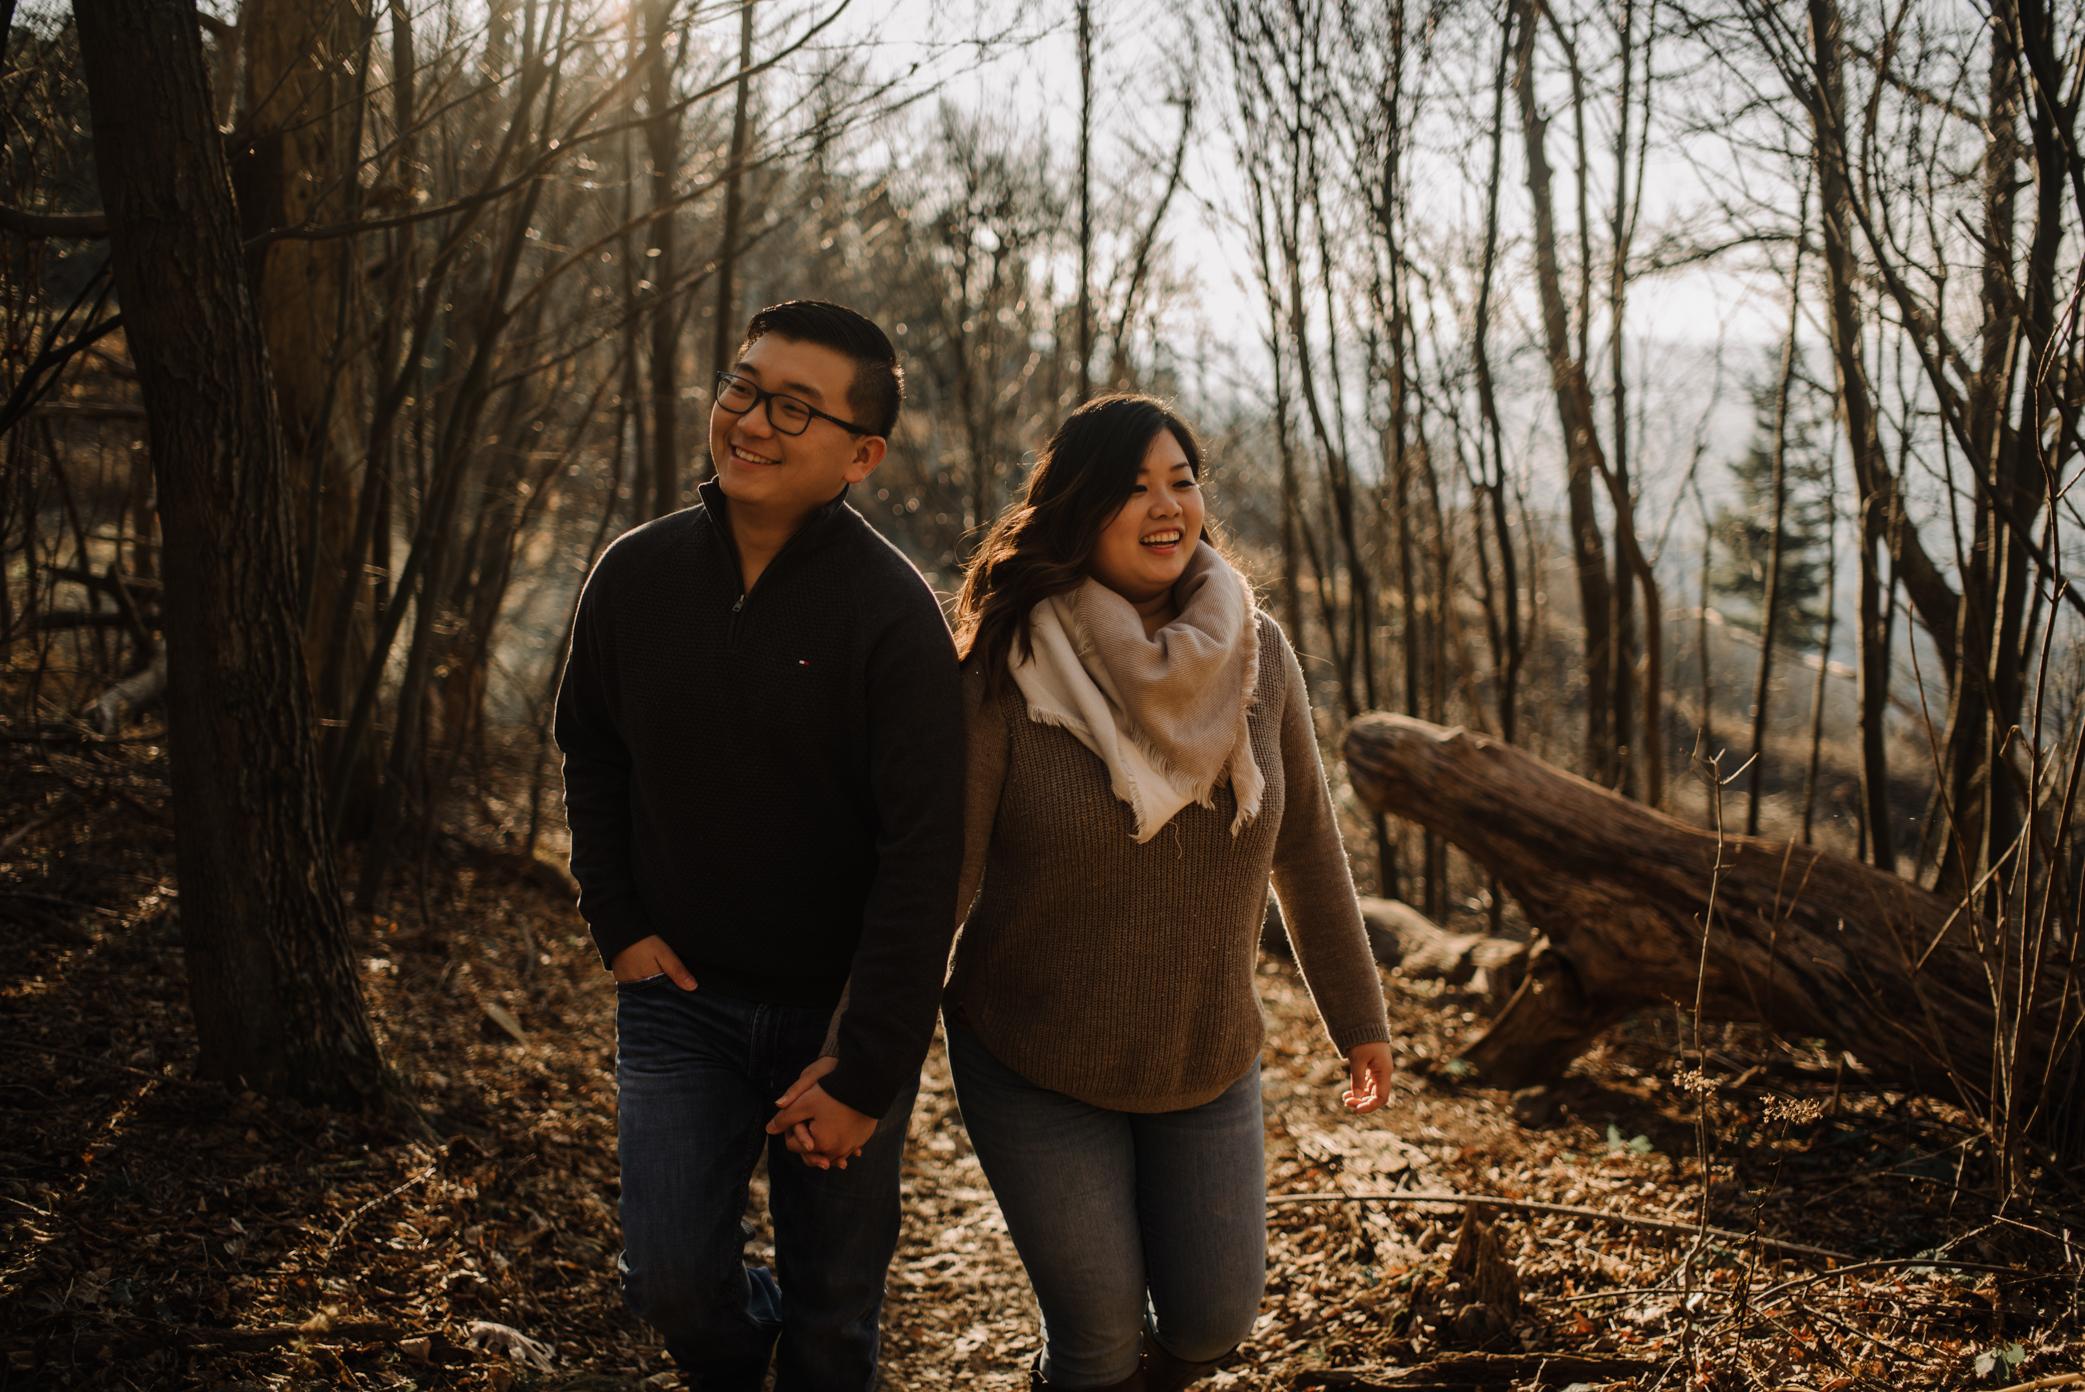 Joshua and Kristina - Shenandoah National Park - Skyline Drive - Winter Engagement Session Photographer - White Sails Creative_11.JPG